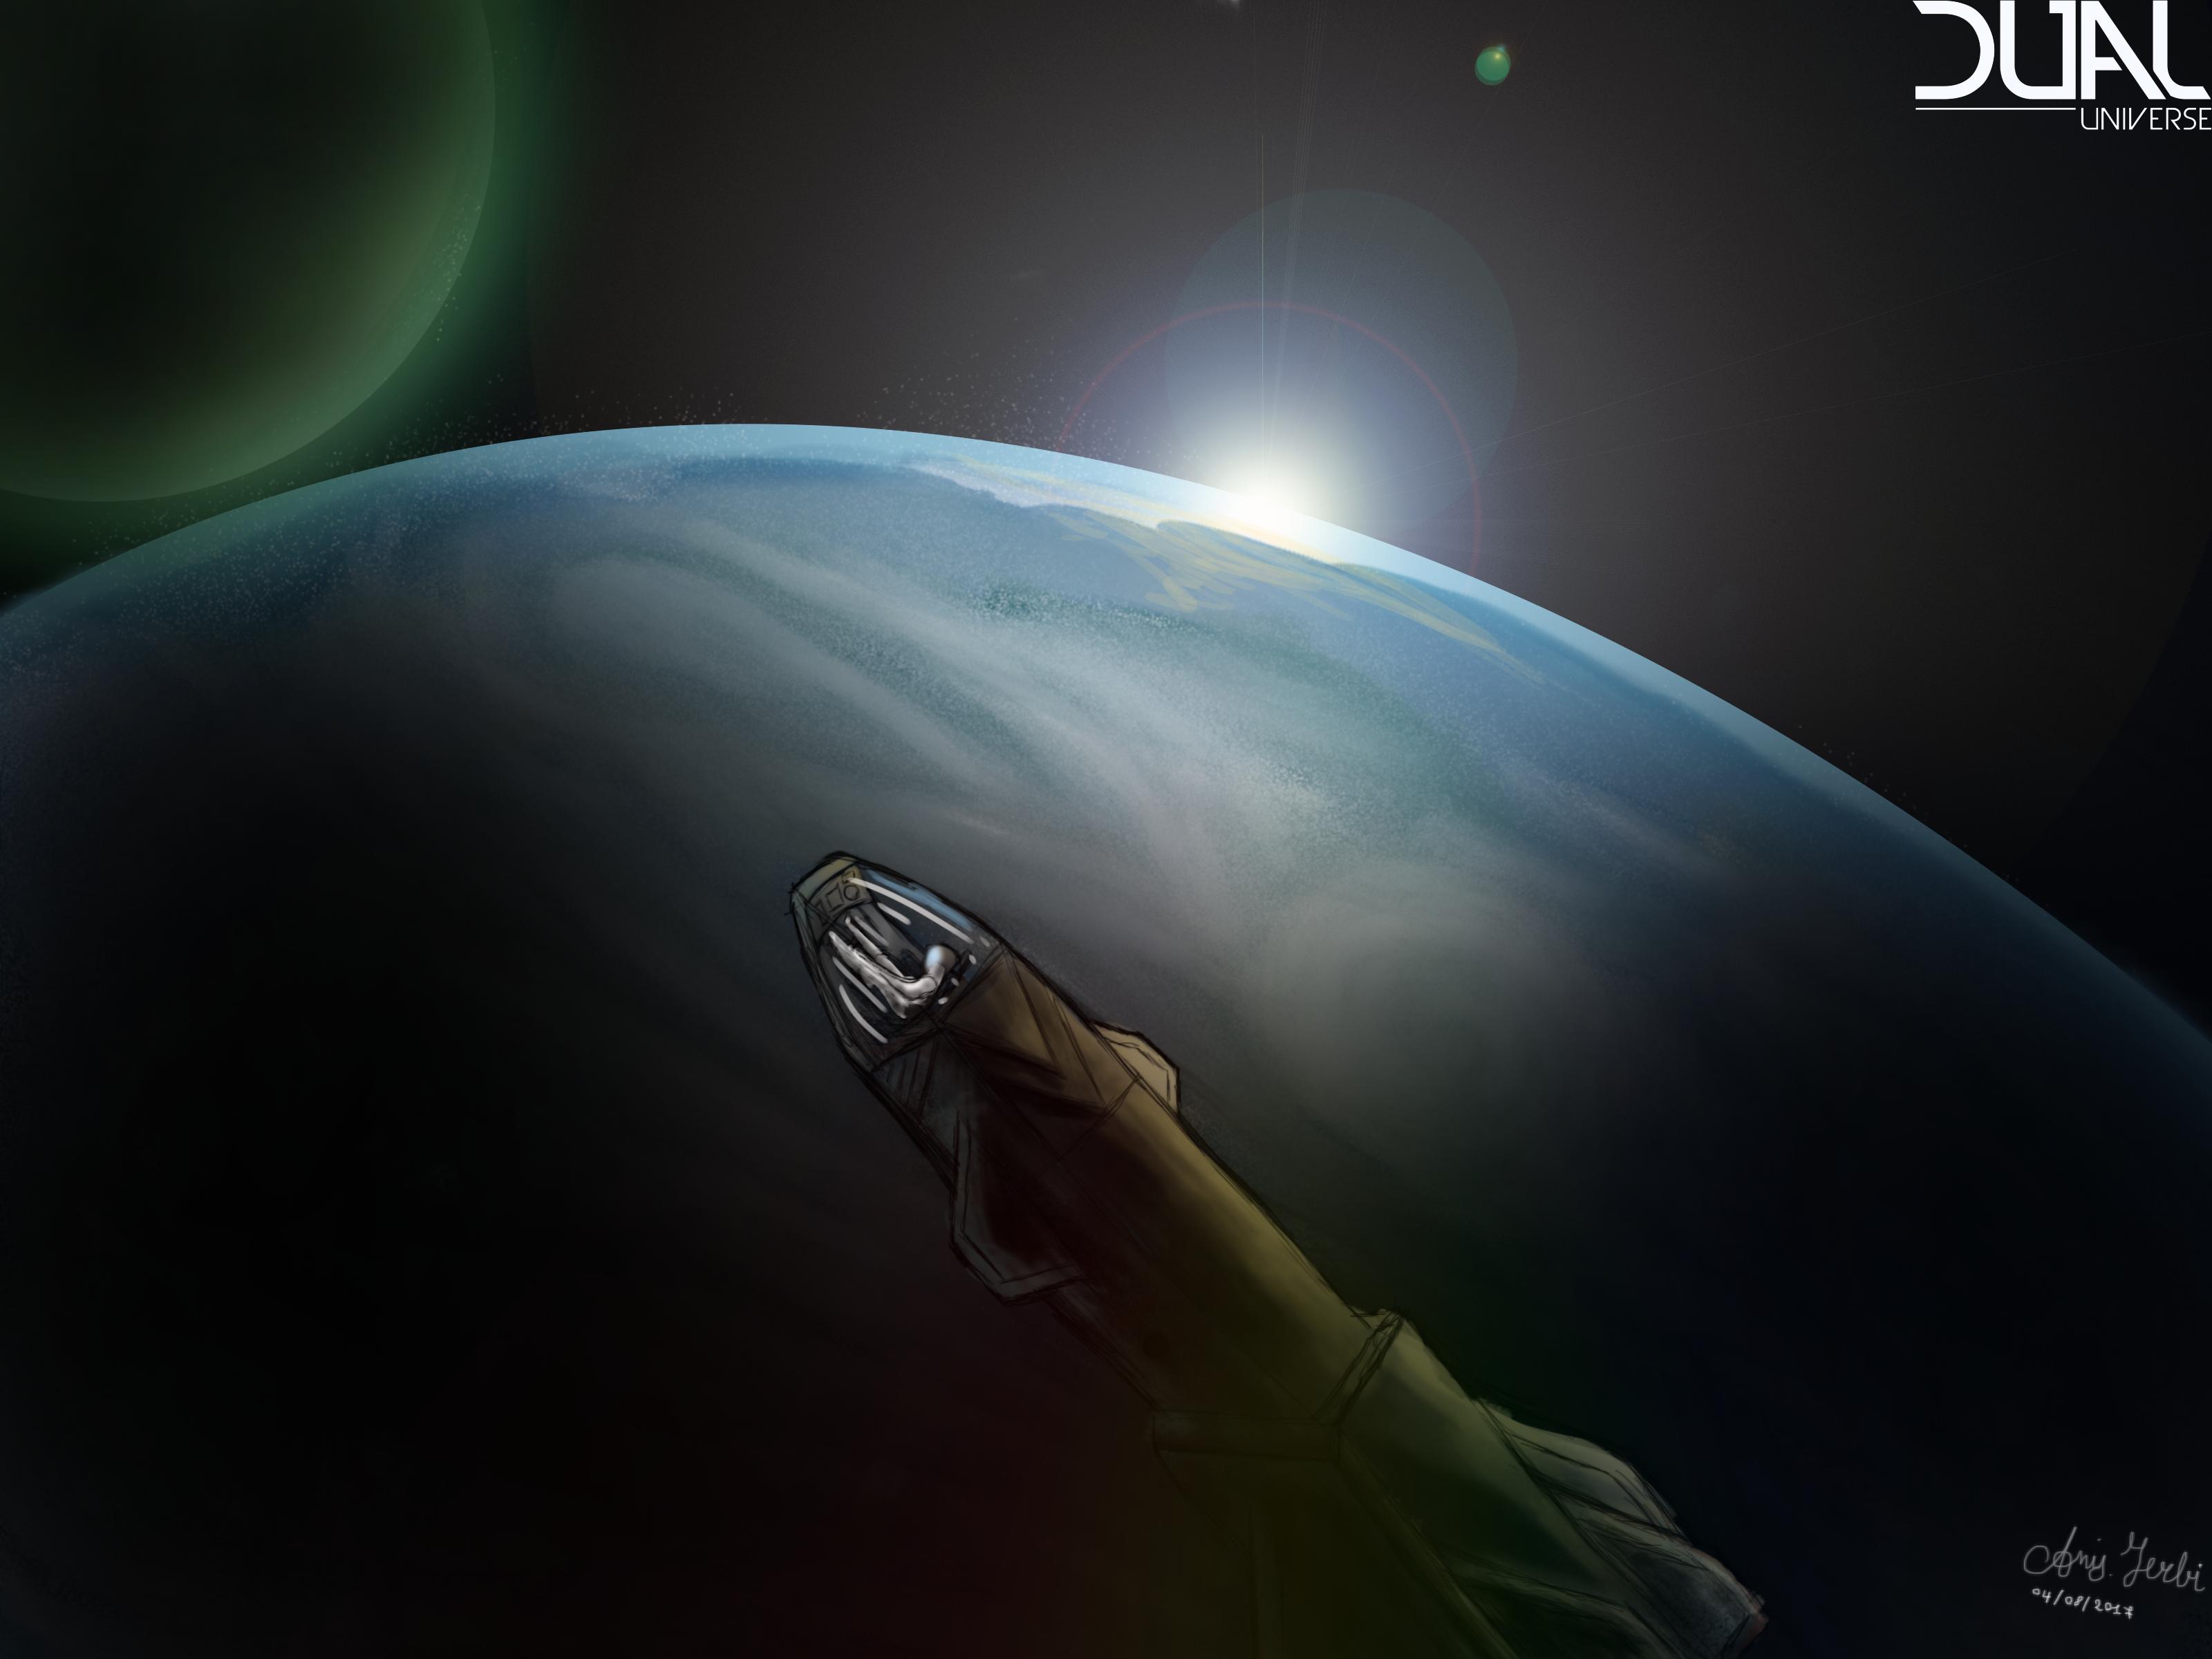 dual universe